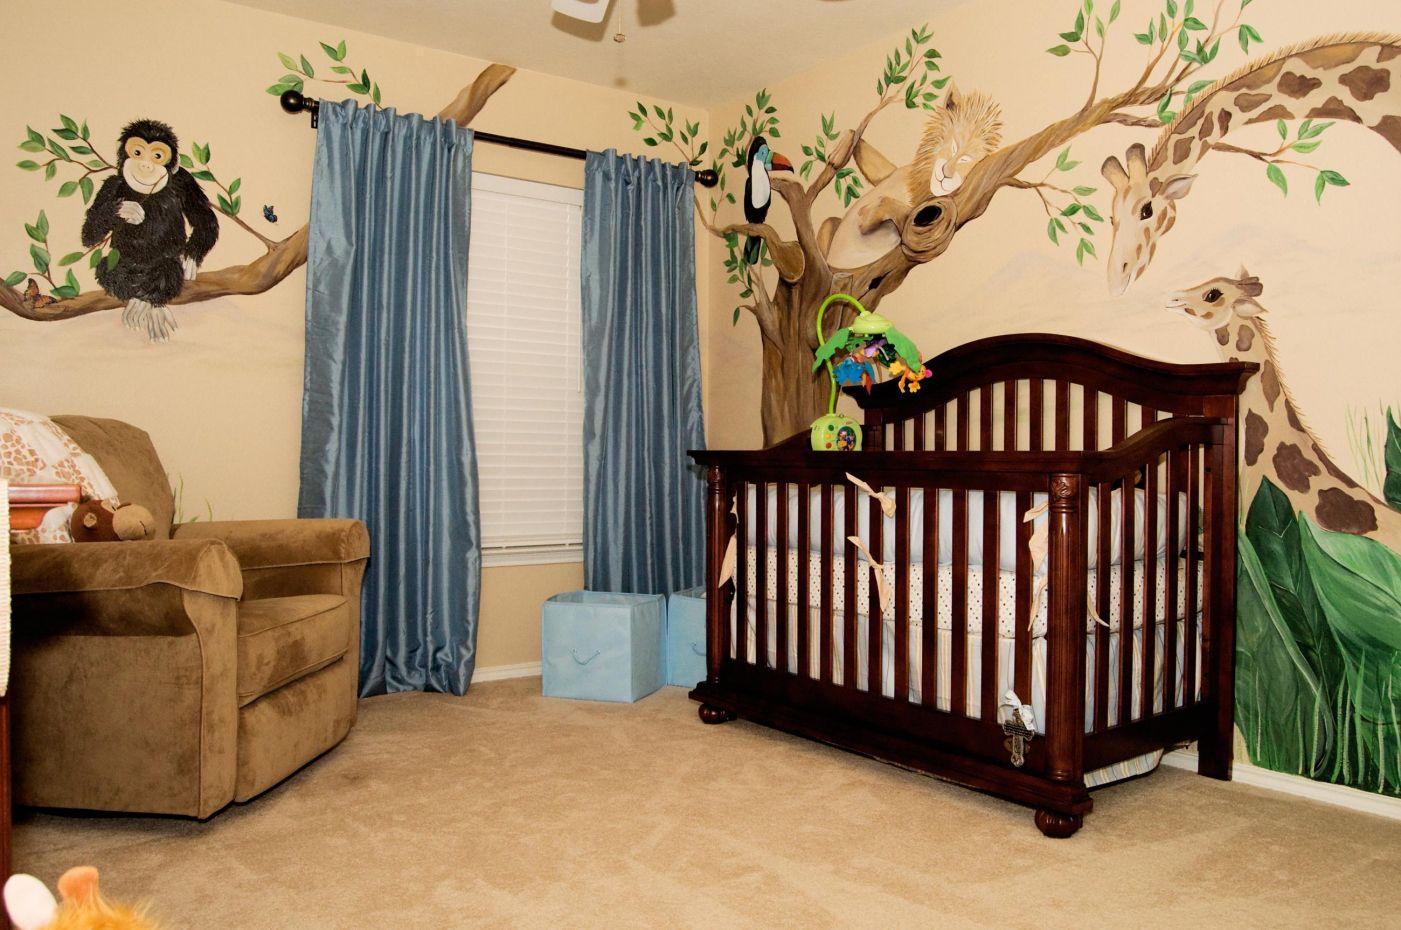 Design A Baby Room Online Migrant Resource Network